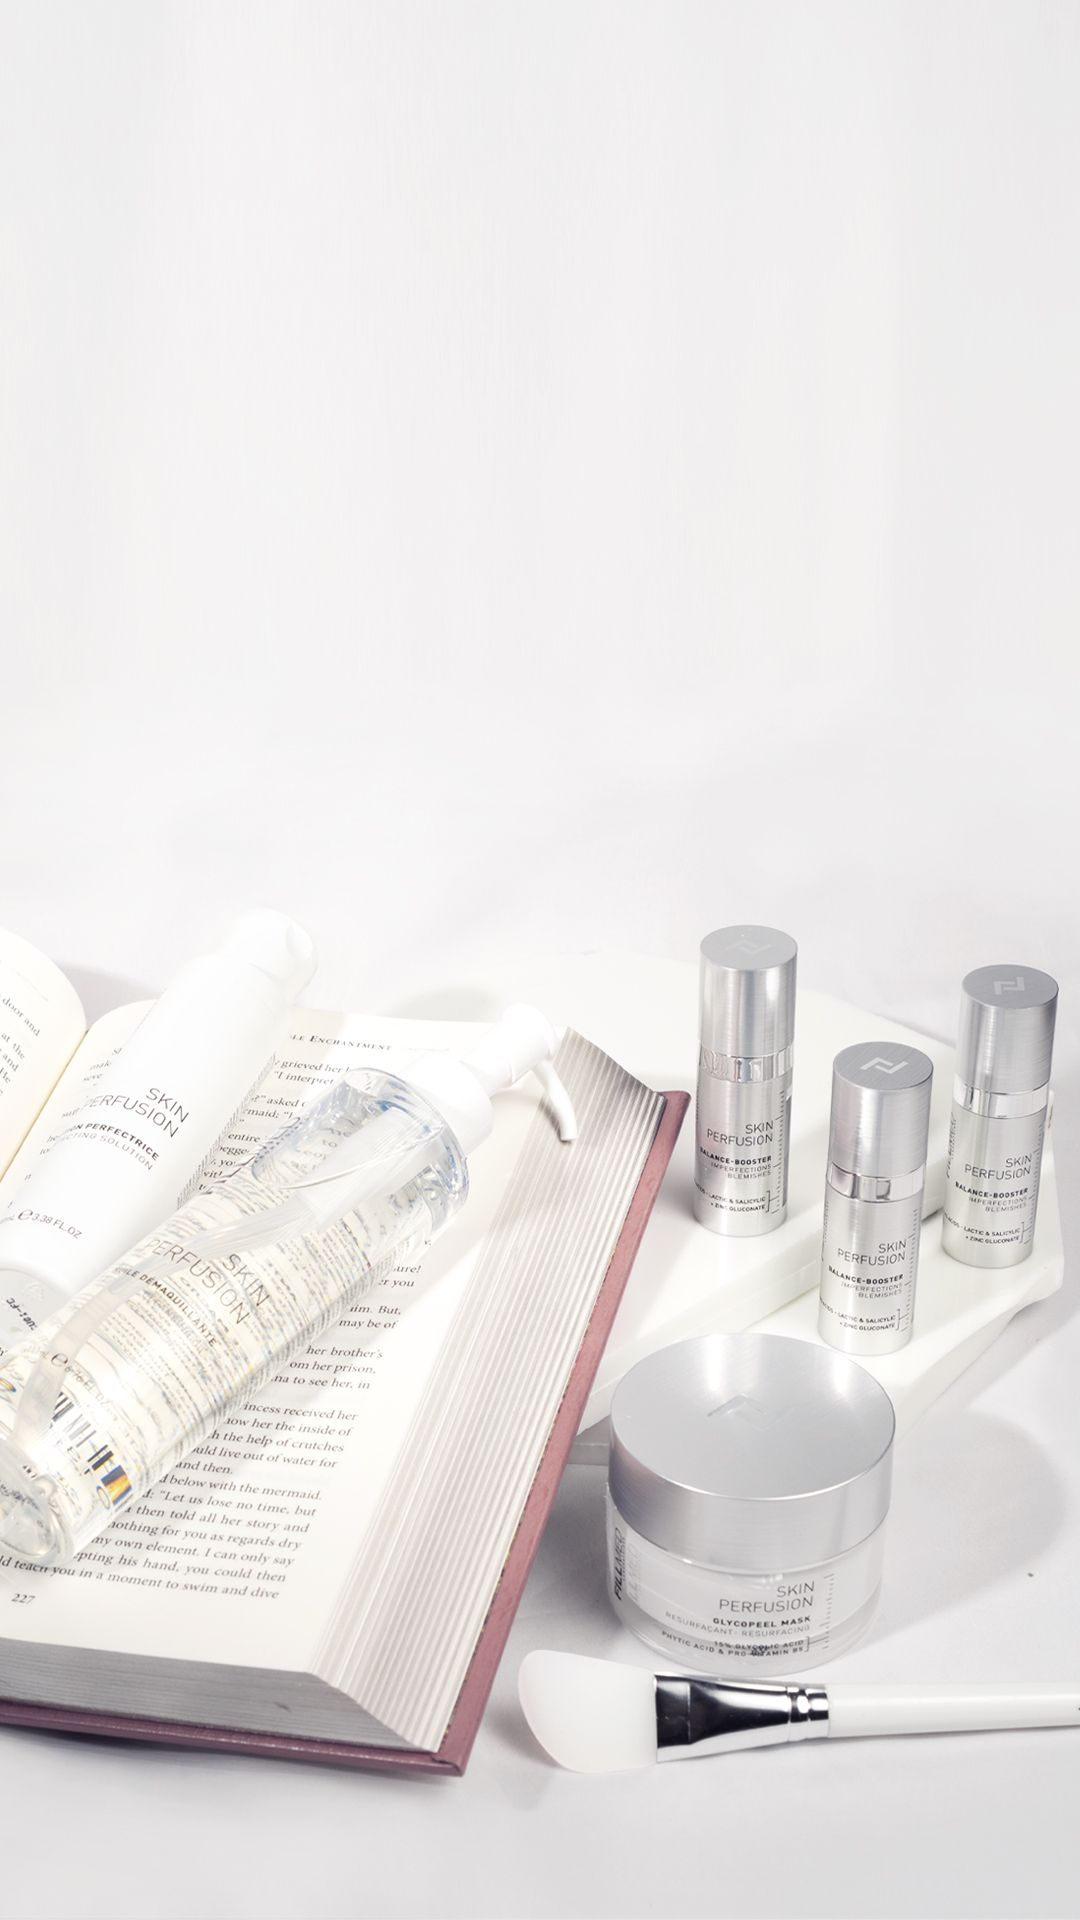 Balance BOOST Skin Perfusion Kit